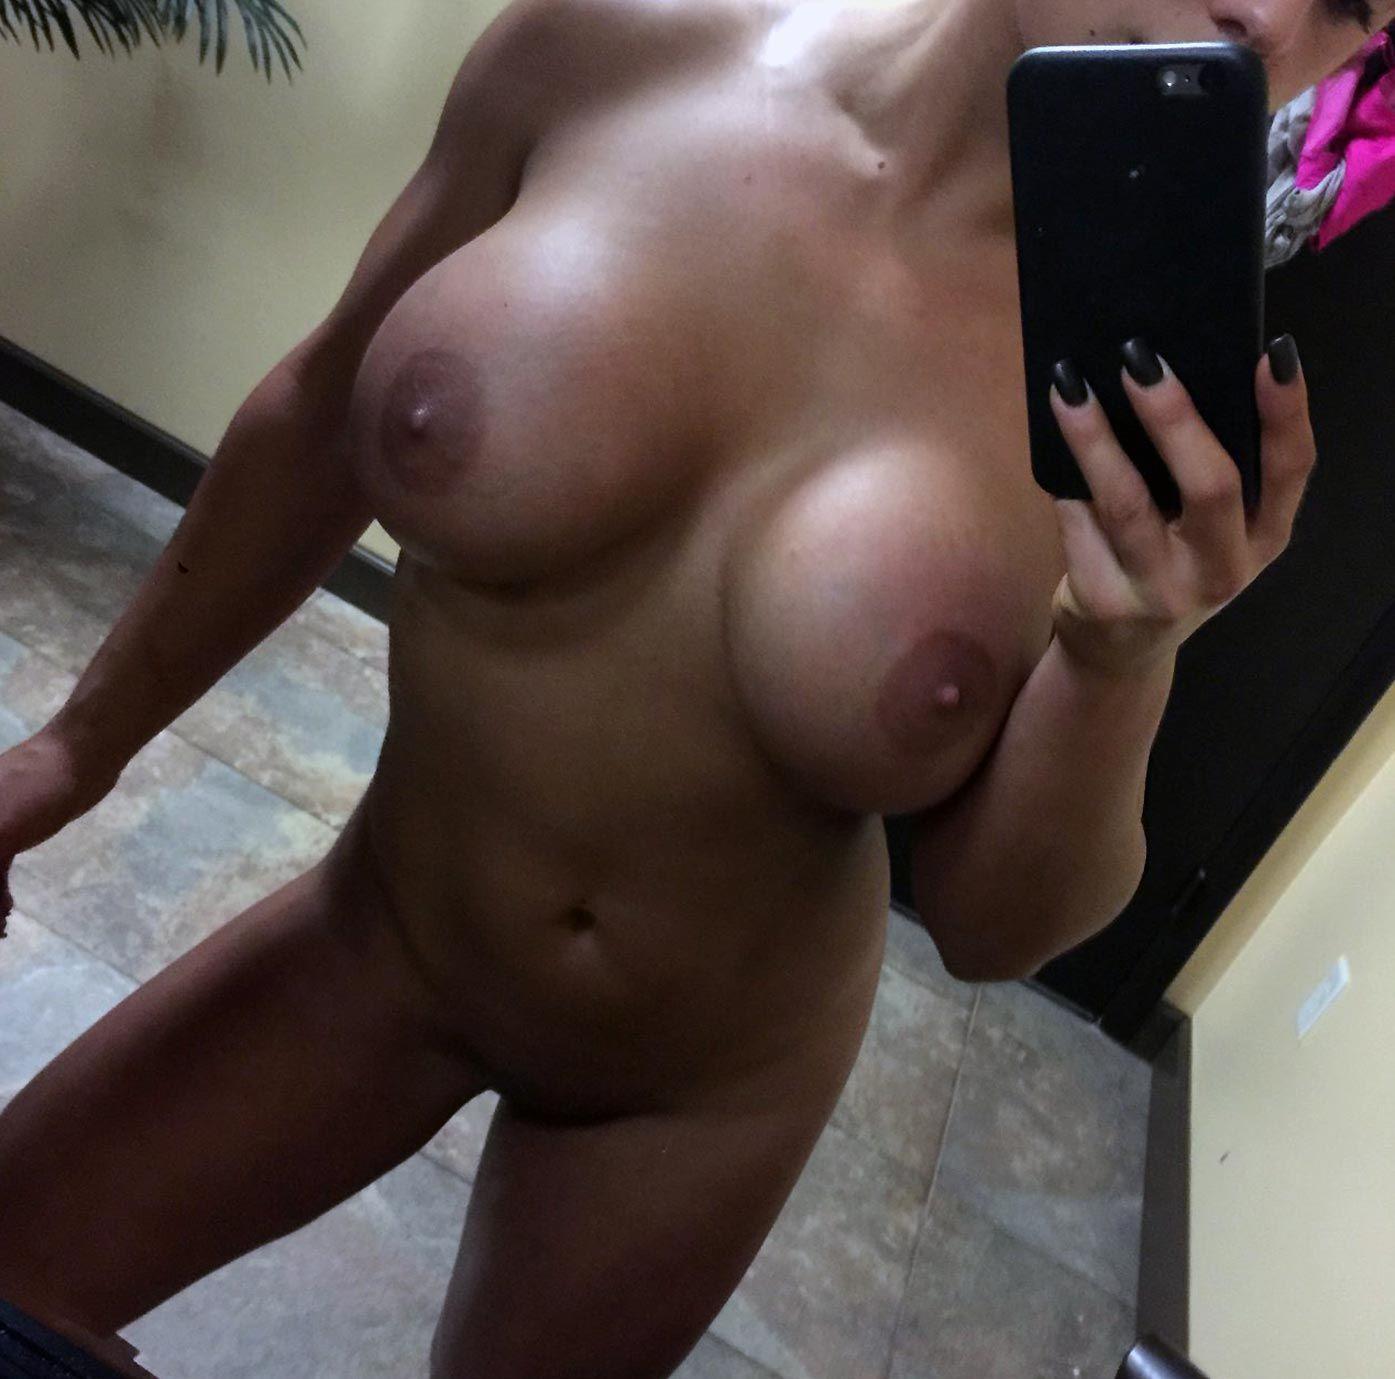 Celeste Bonin Nude Leaked The Fappening & Sexy 0262